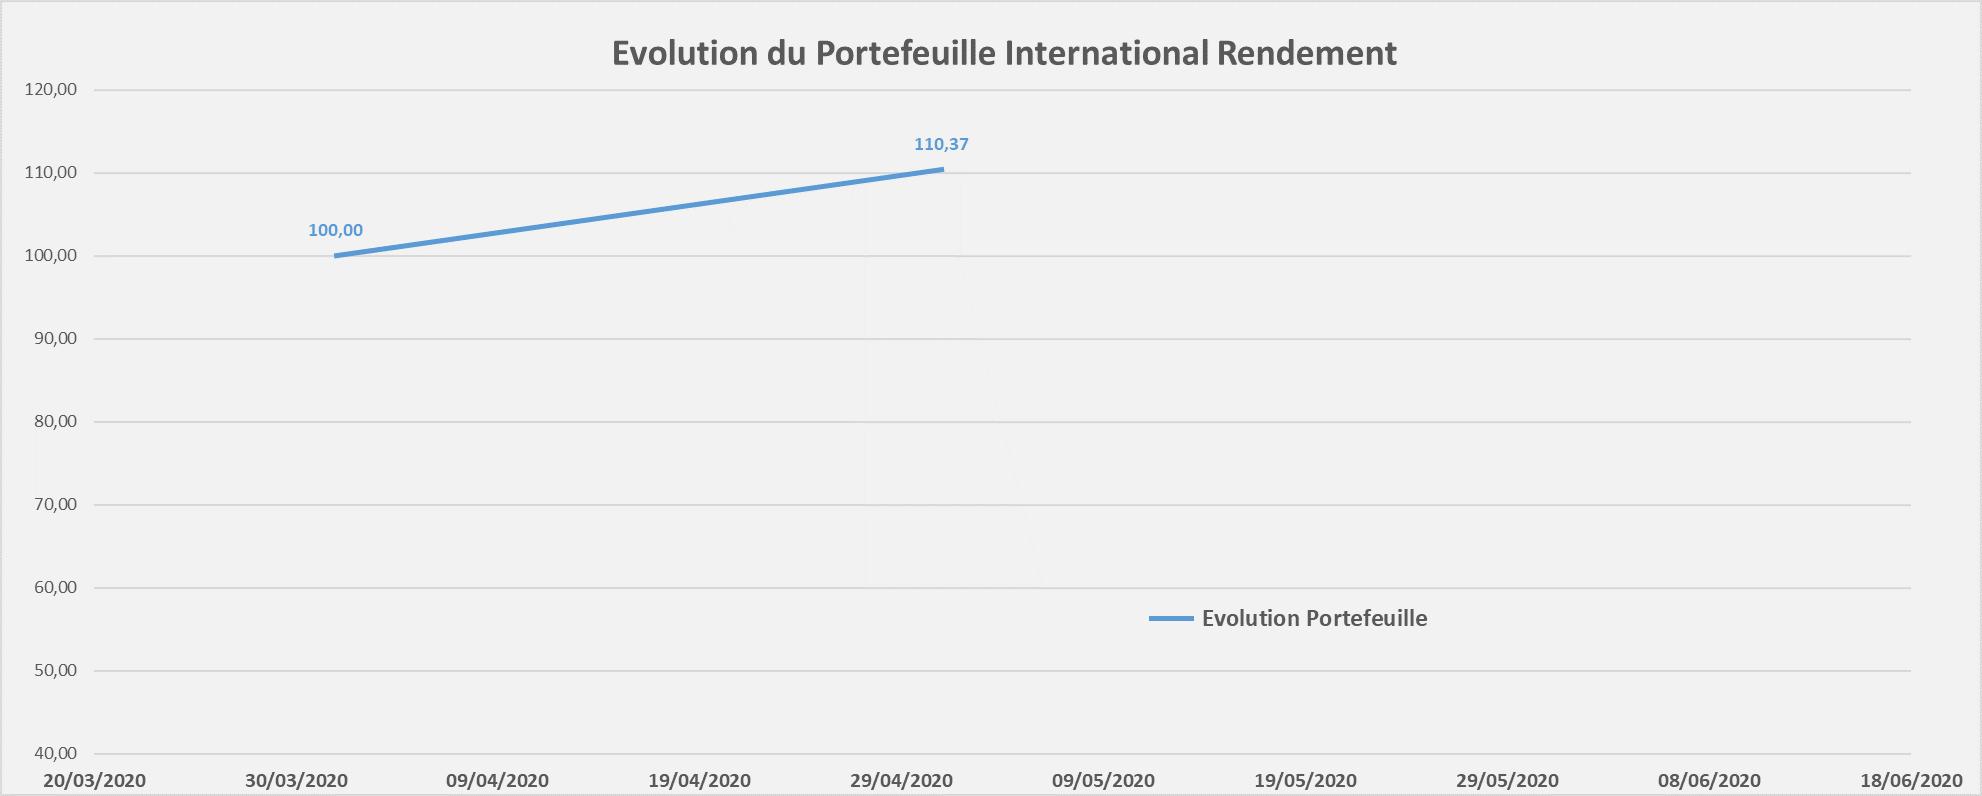 suivi performance portefeuille International Rendement avril 2020